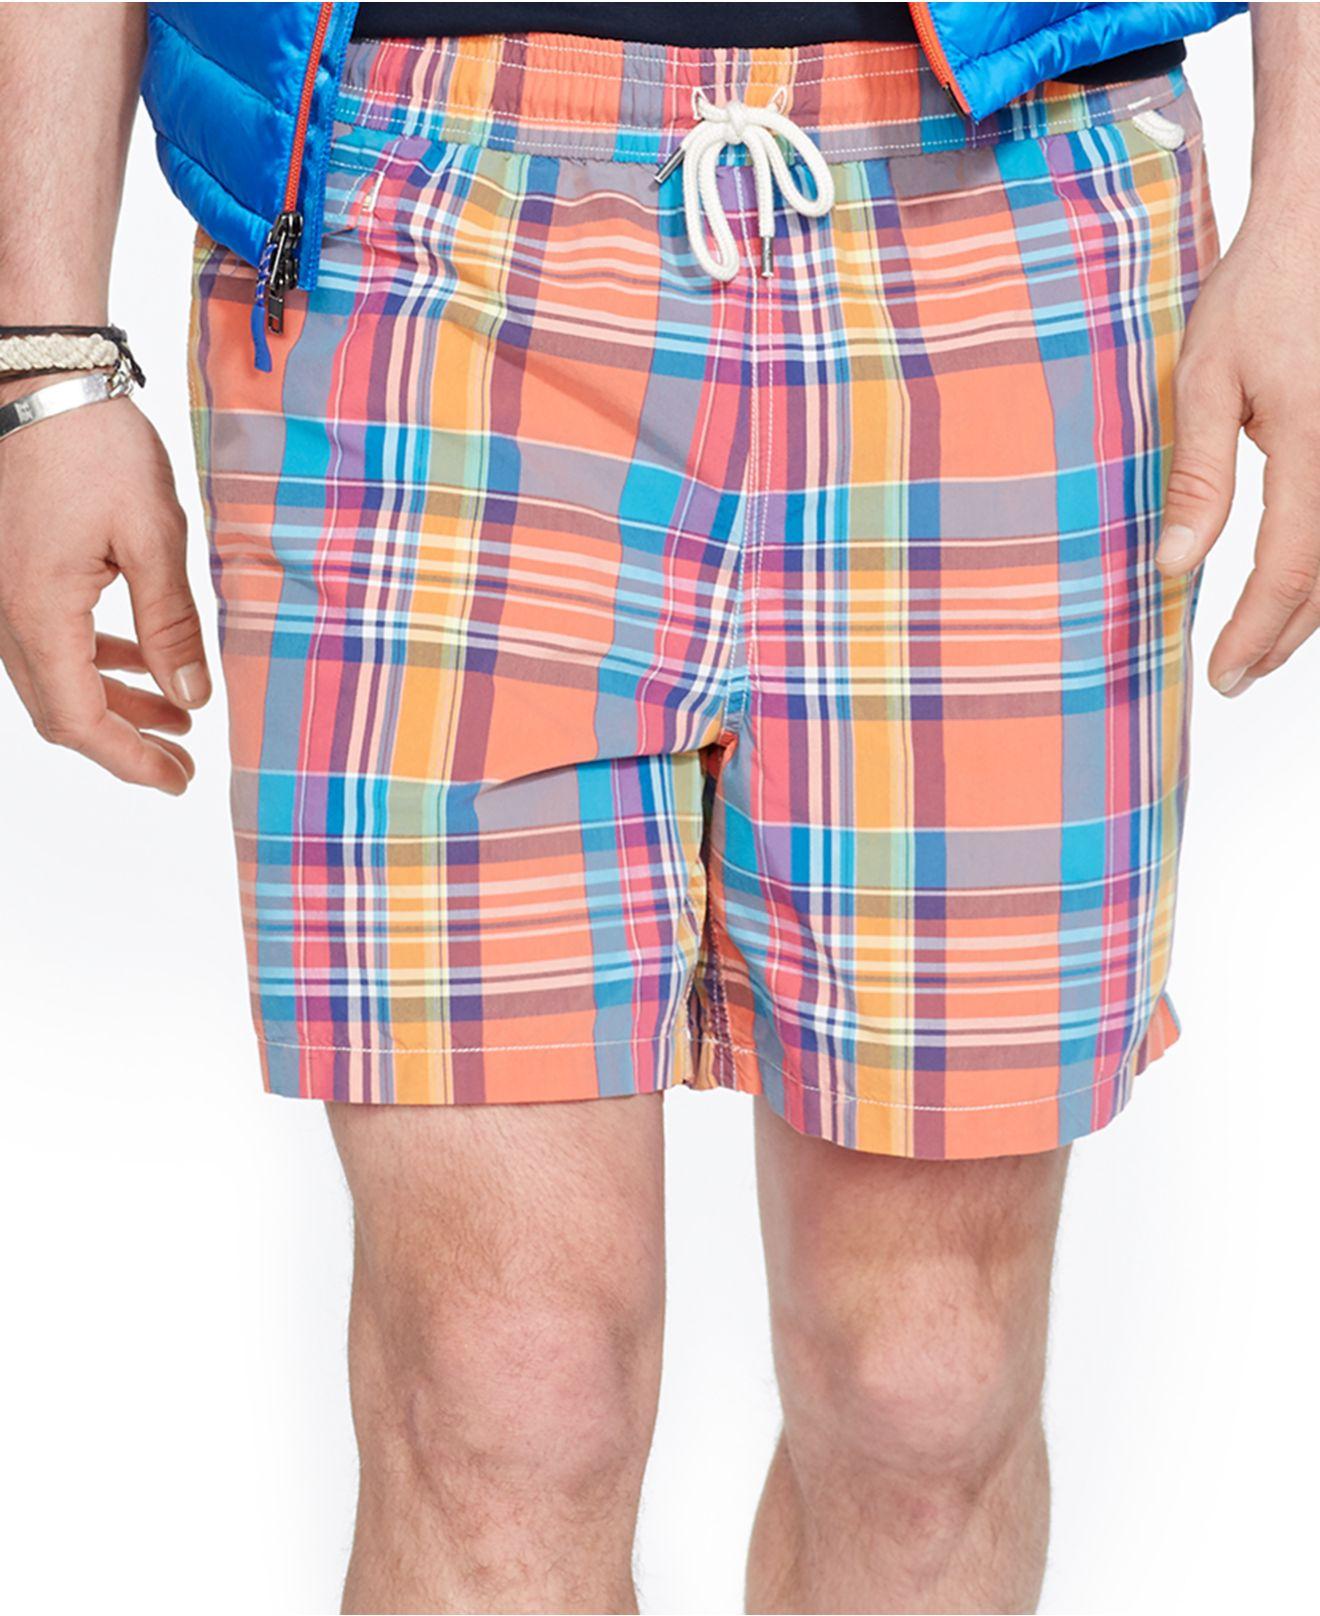 Ralph Lauren Menswear - Ralph Lauren Traveler Swim Shorts Orange